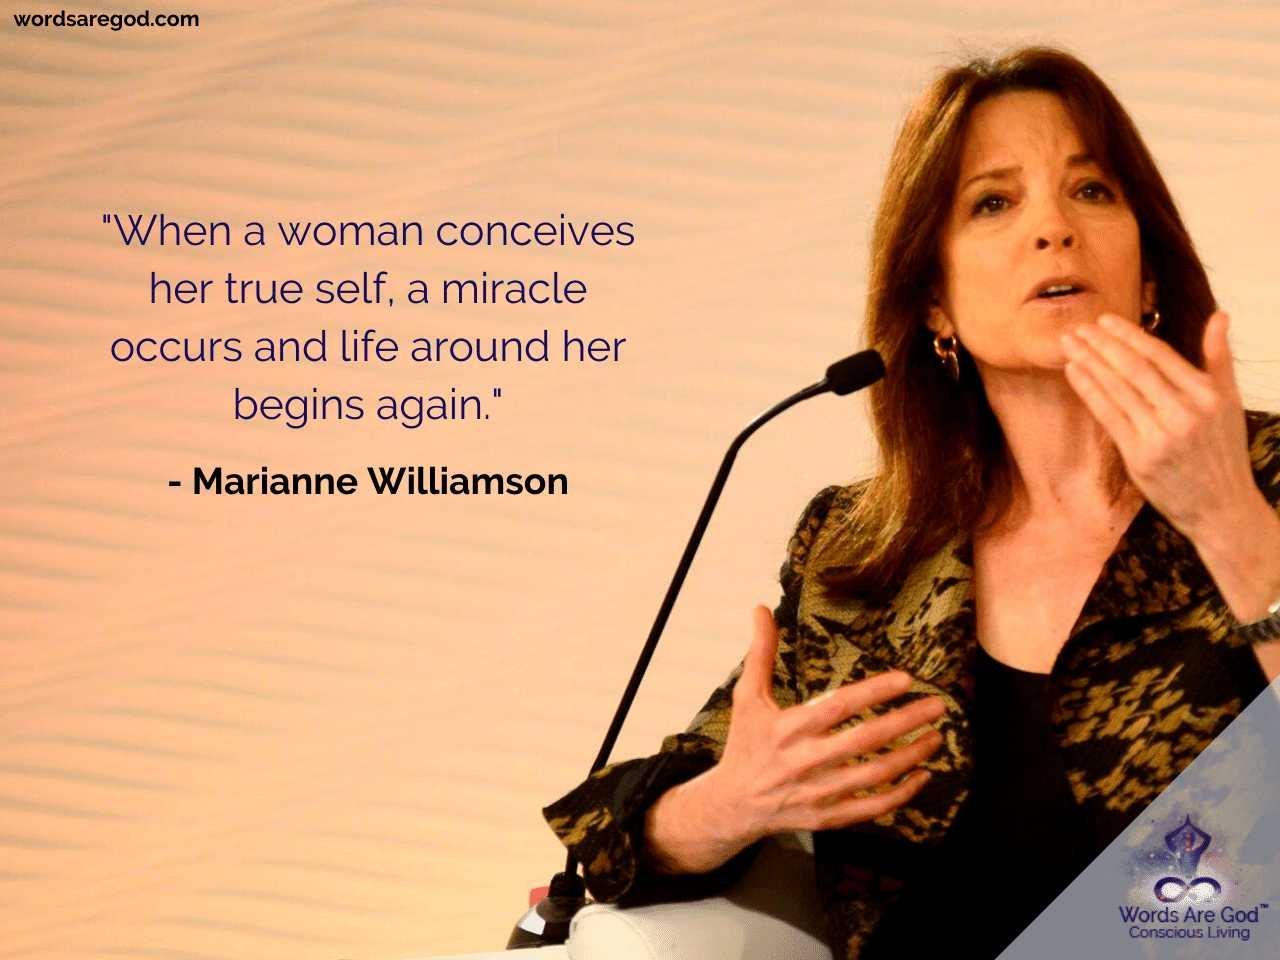 Marianne Williamson Inspirational Quote